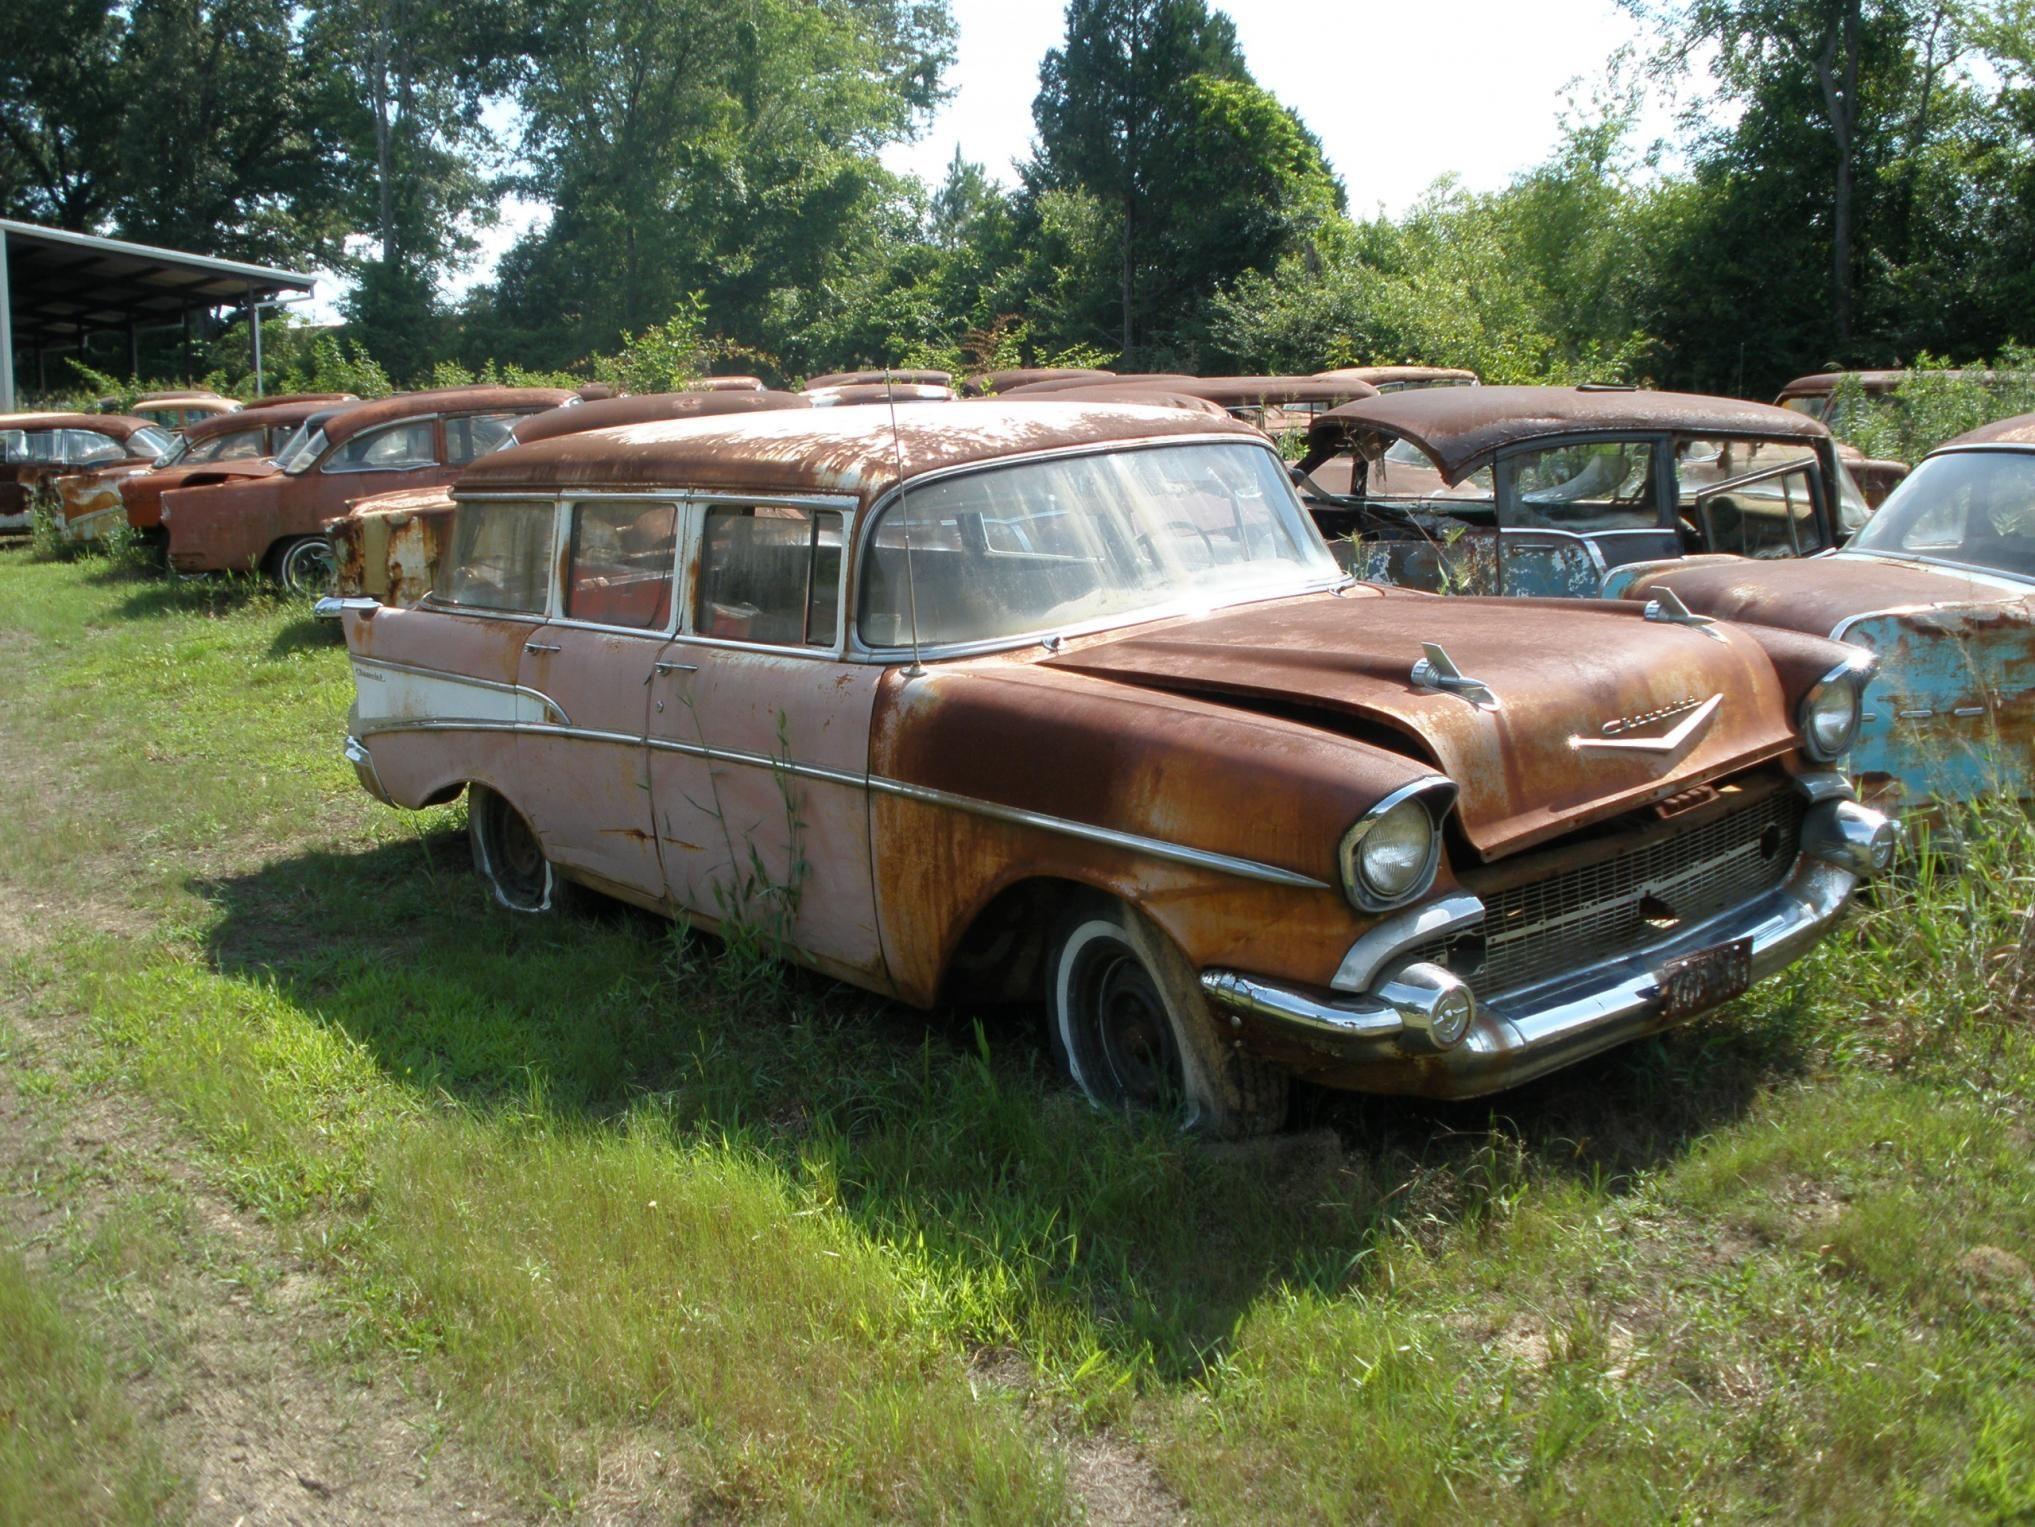 Tridoor Trifive 1957 Chevrolet Crew Cab Barn Finds T Chevy